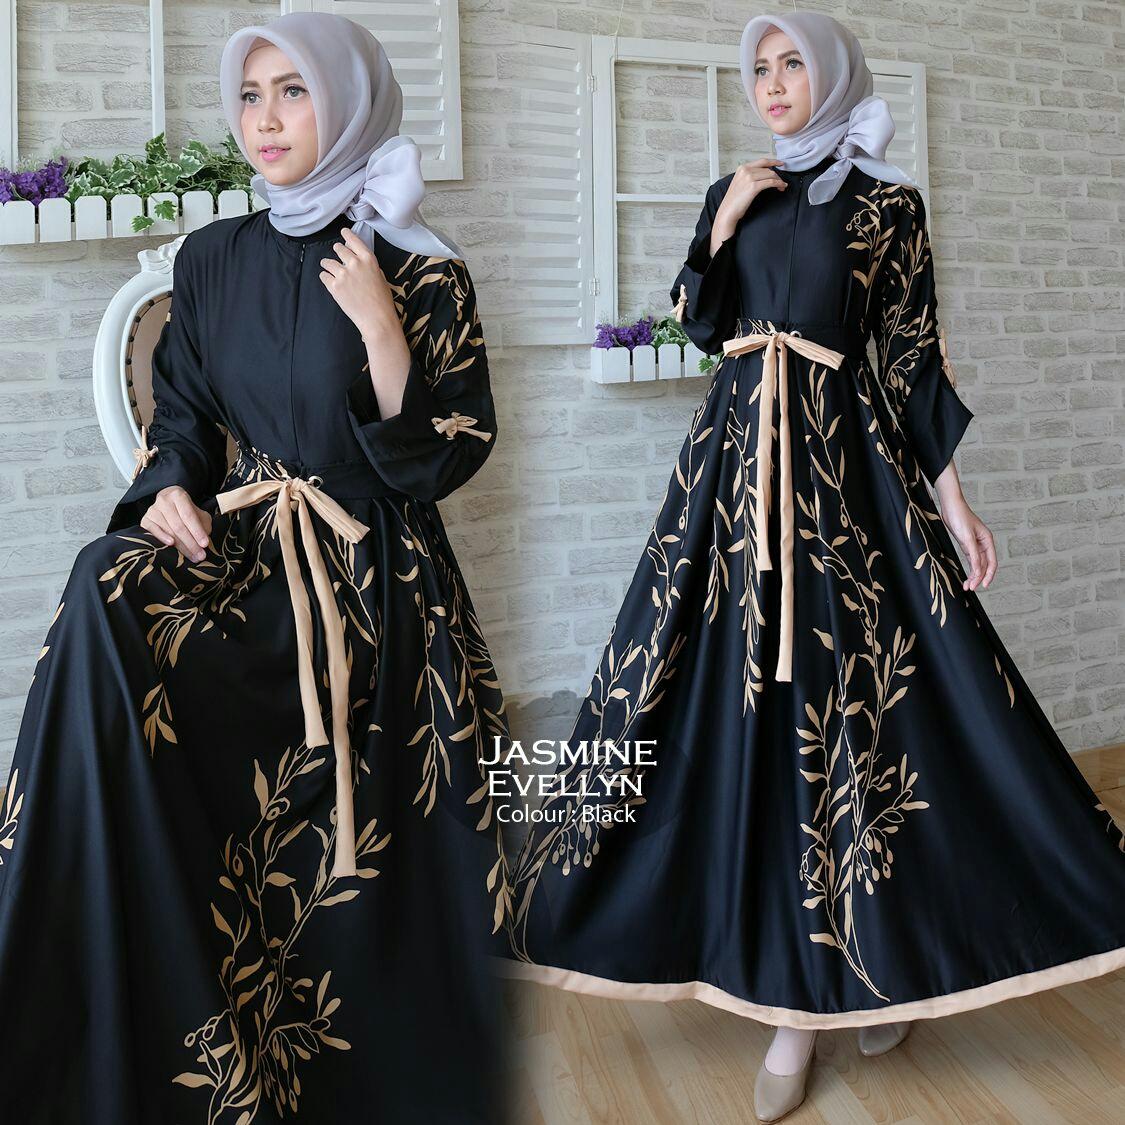 Baju Gamis Modern Jasmine Maxi Busana Muslim Remaja Butik Jingga